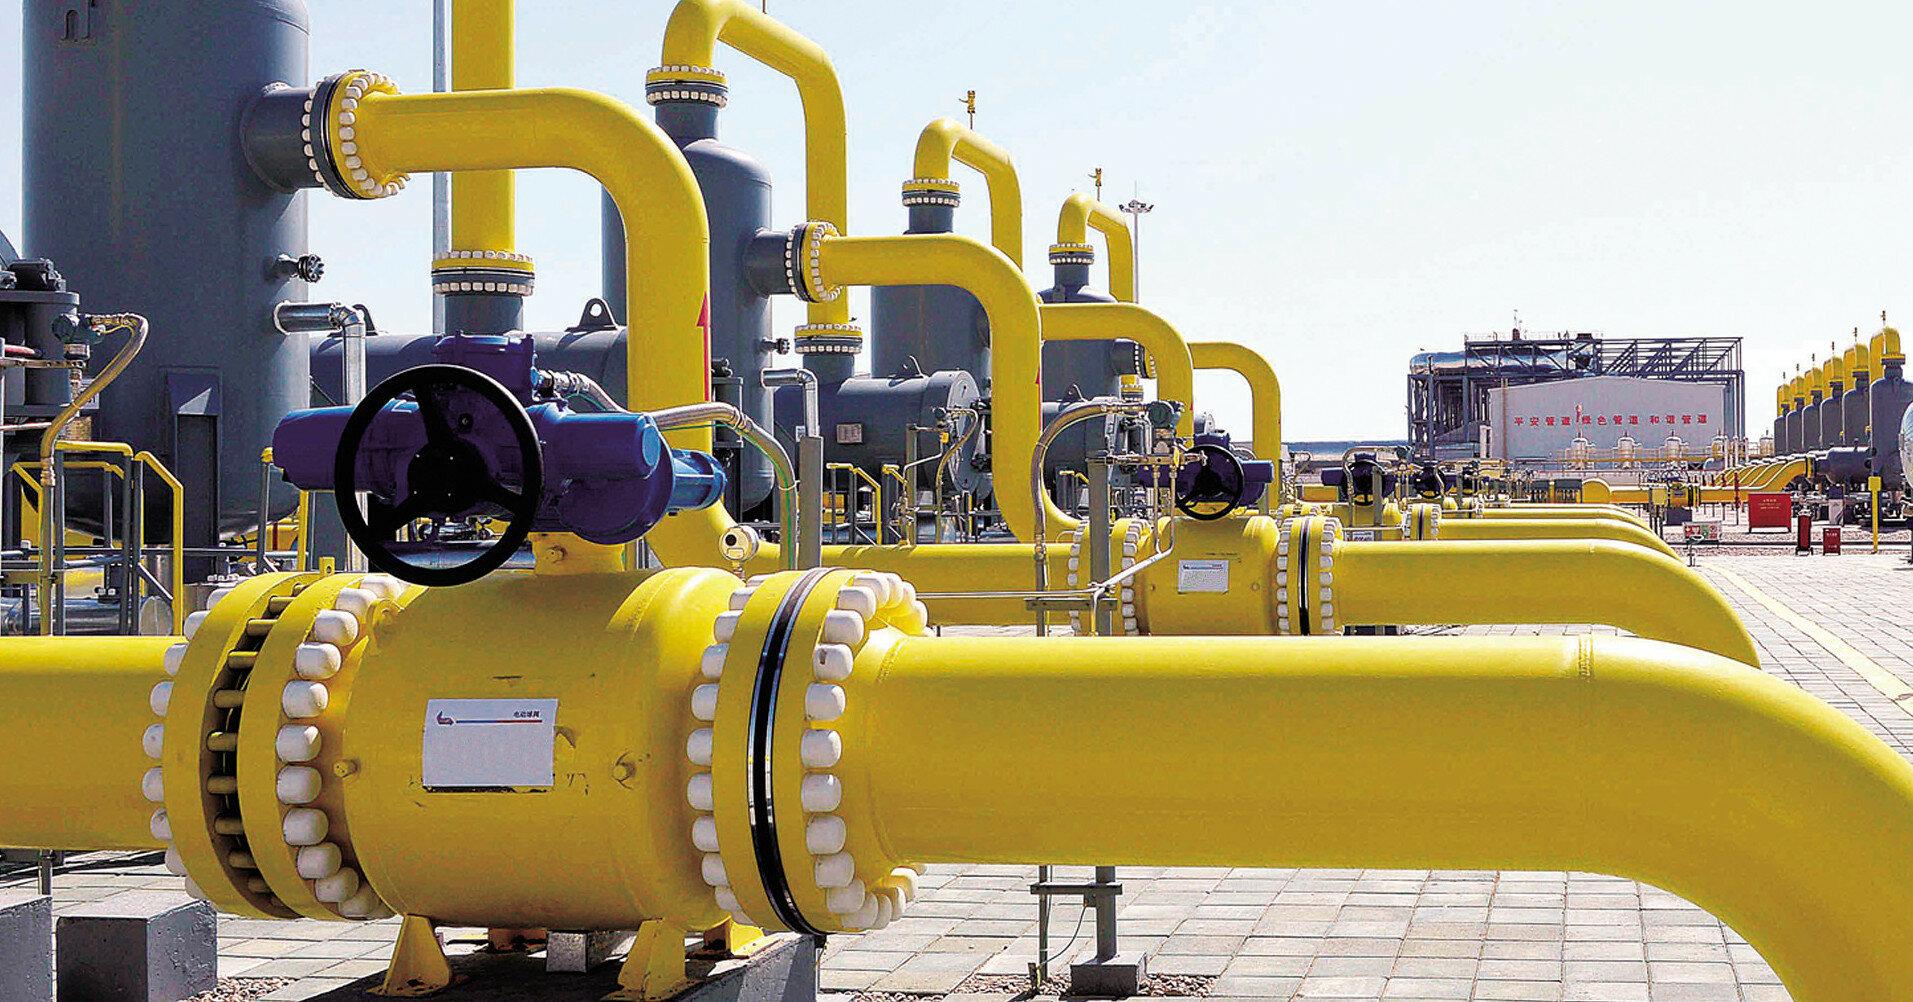 Газпром частично восстановил поставки газа в ЕС после аварии